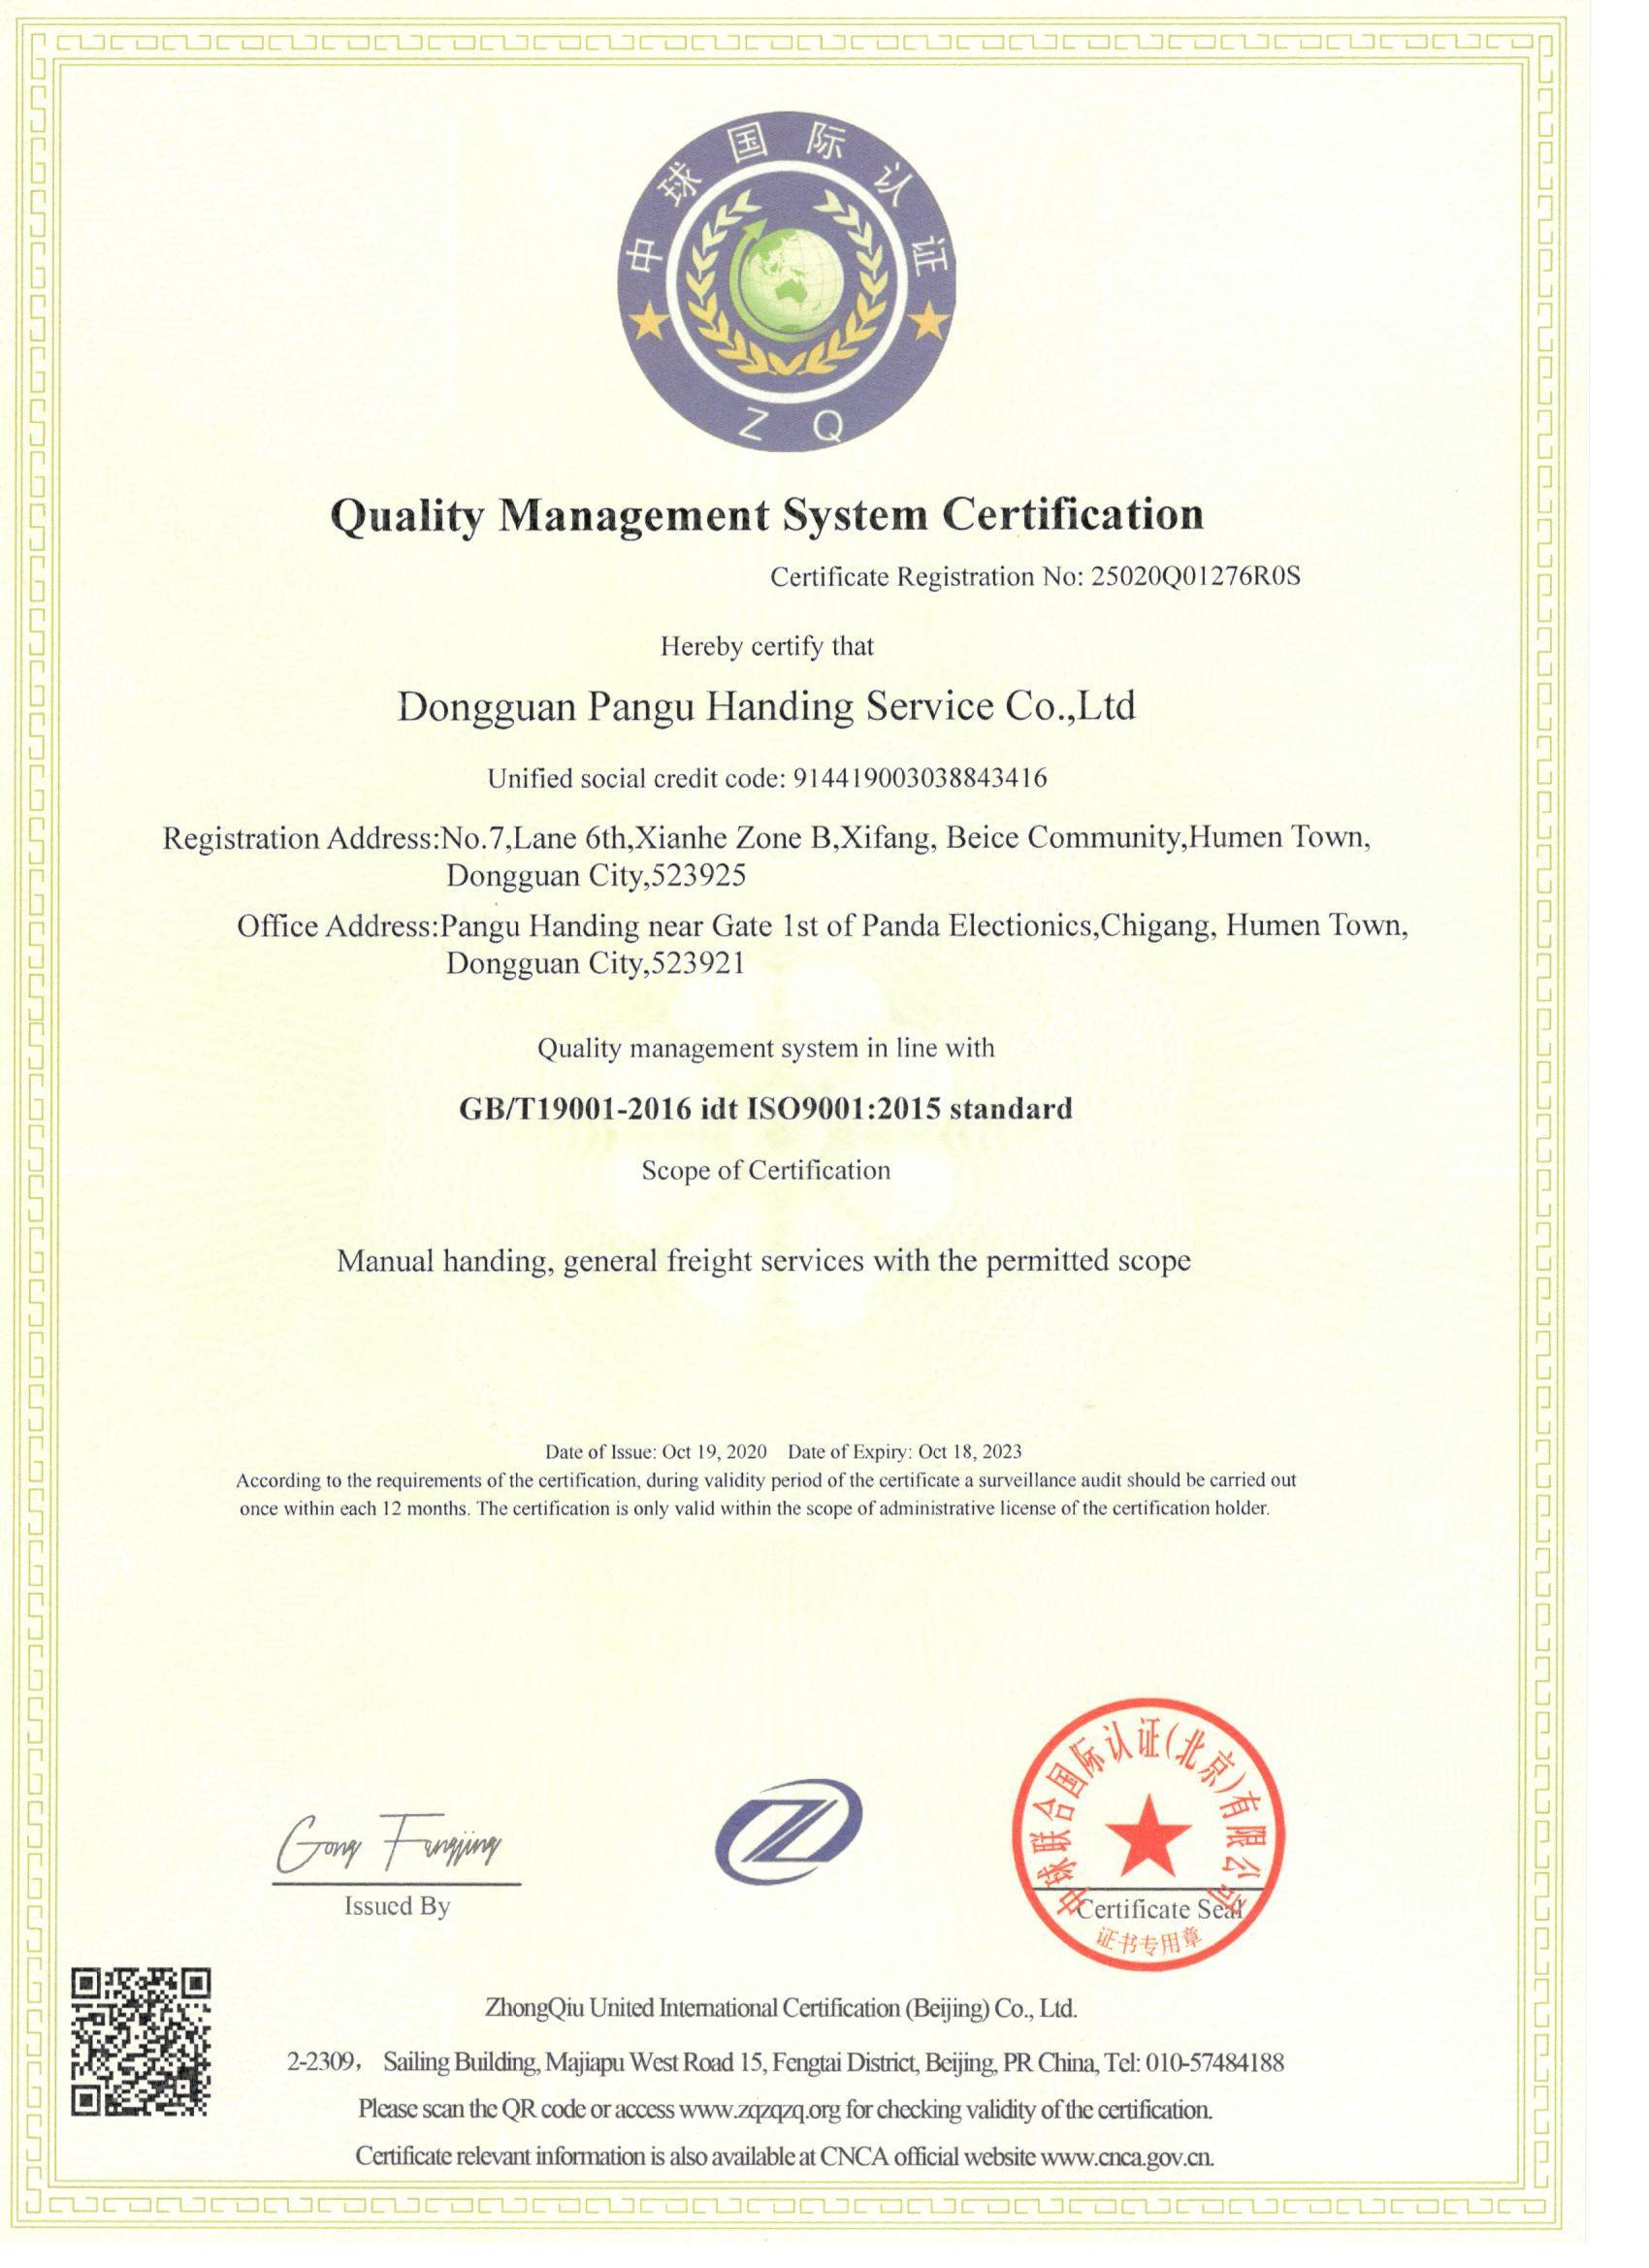 Quality Management System Certification认证-东莞市盘古搬运服务有限公司